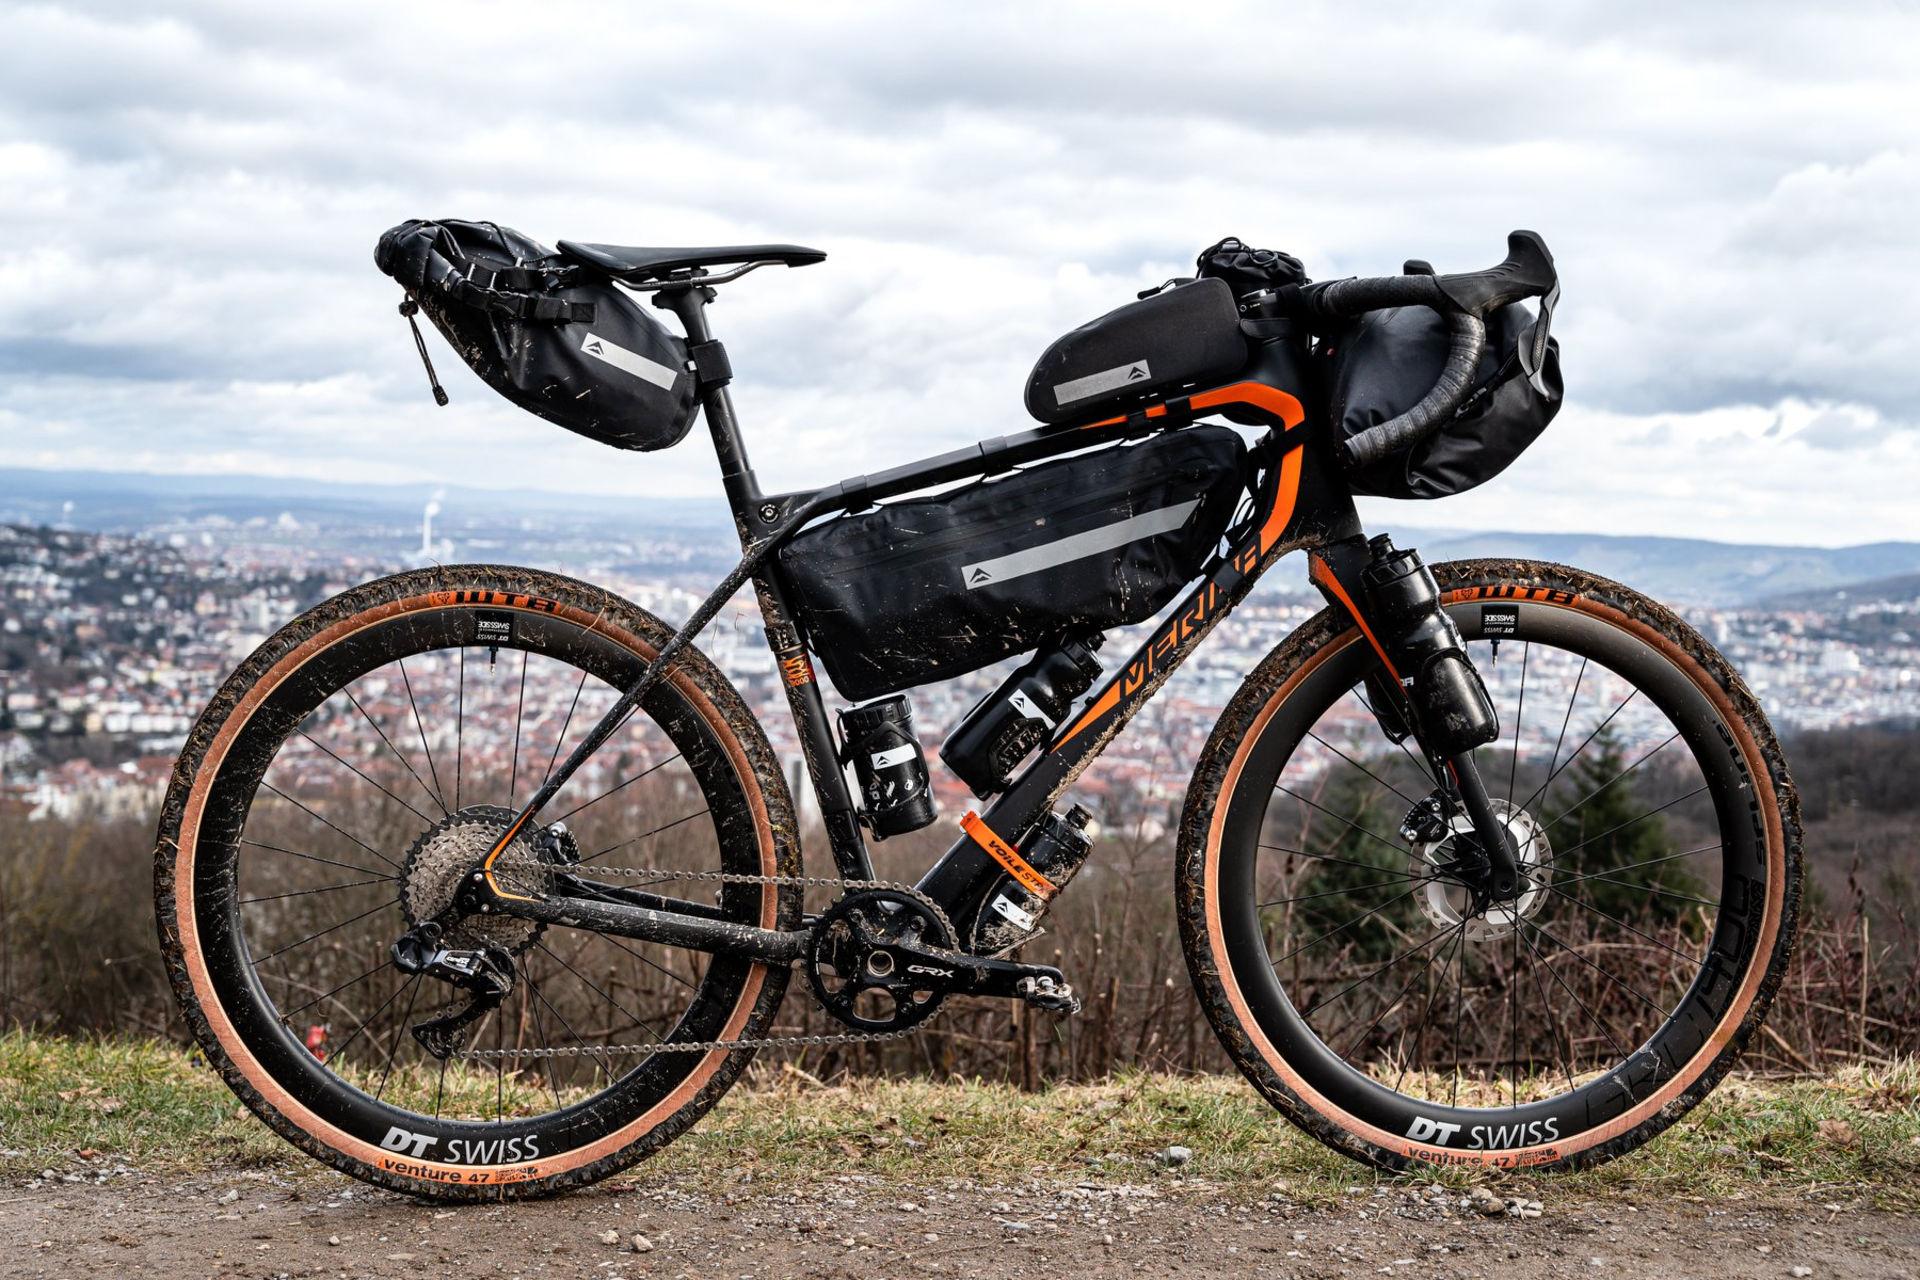 Merida Silex, Silex, gravel, bikepacking, wyprawy rowerowe, rower gravel, rowery gravelowe